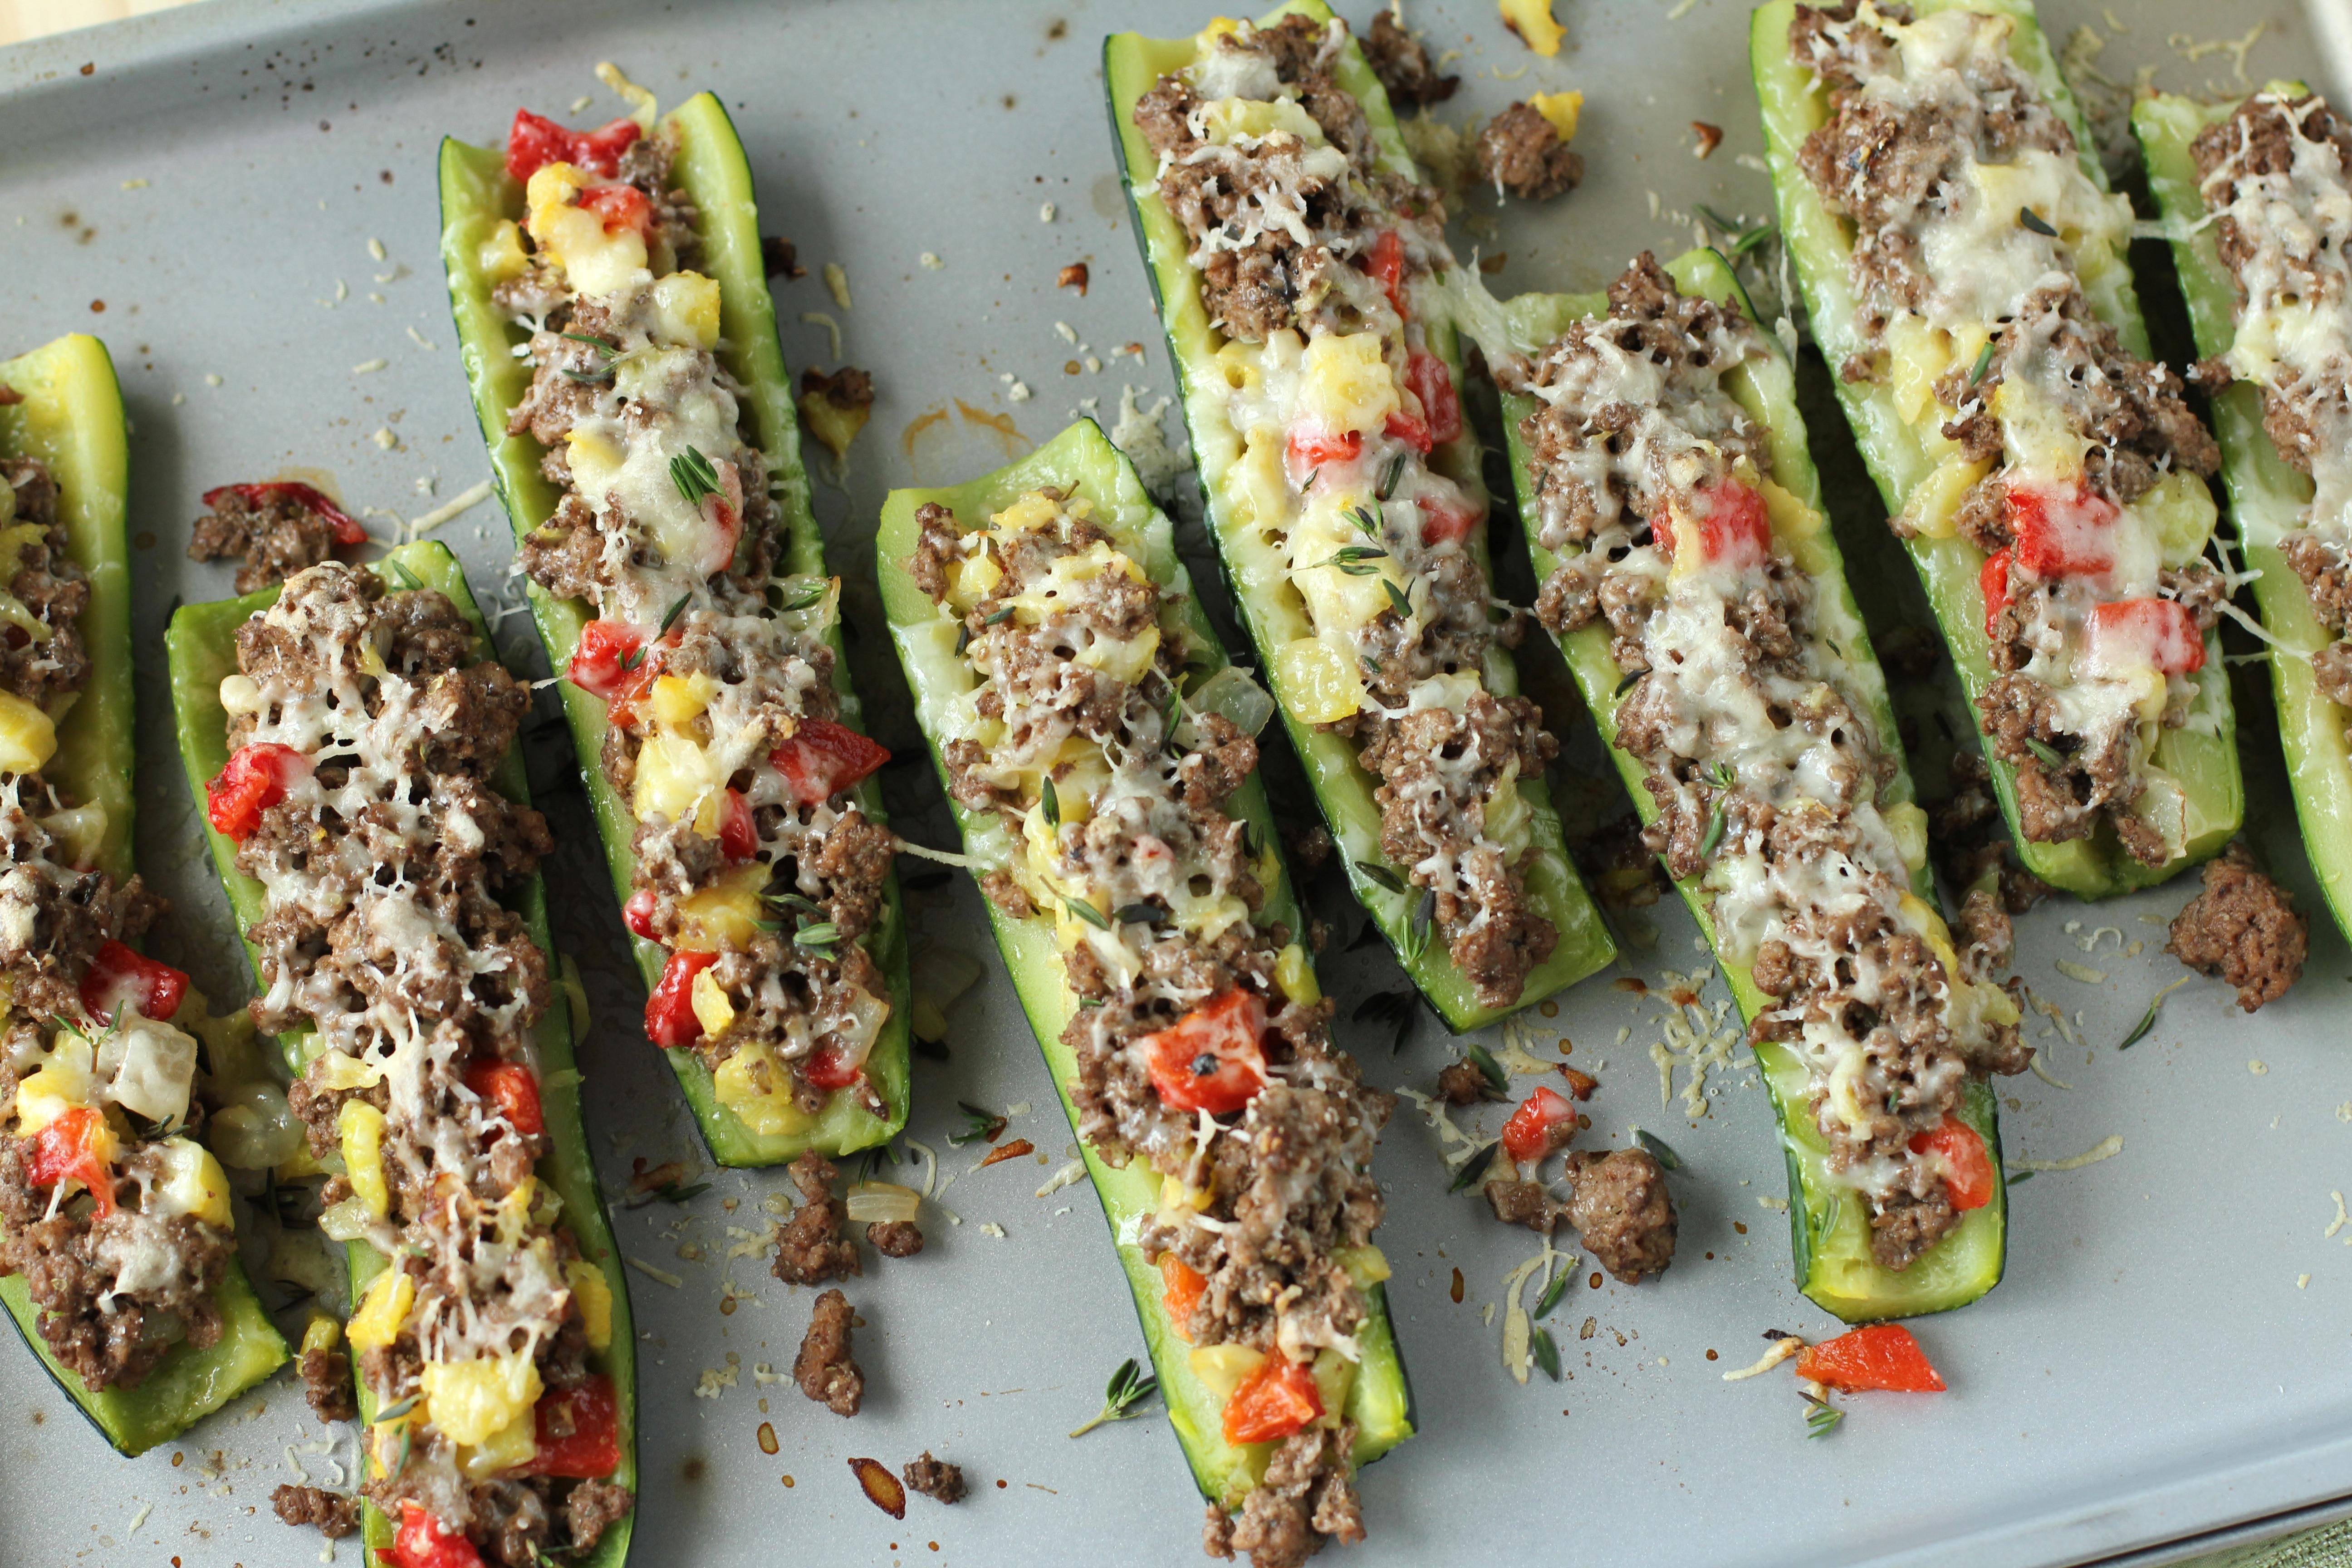 Zucchini Recipe Healthy  Healthy Recipes For Zucchini Food